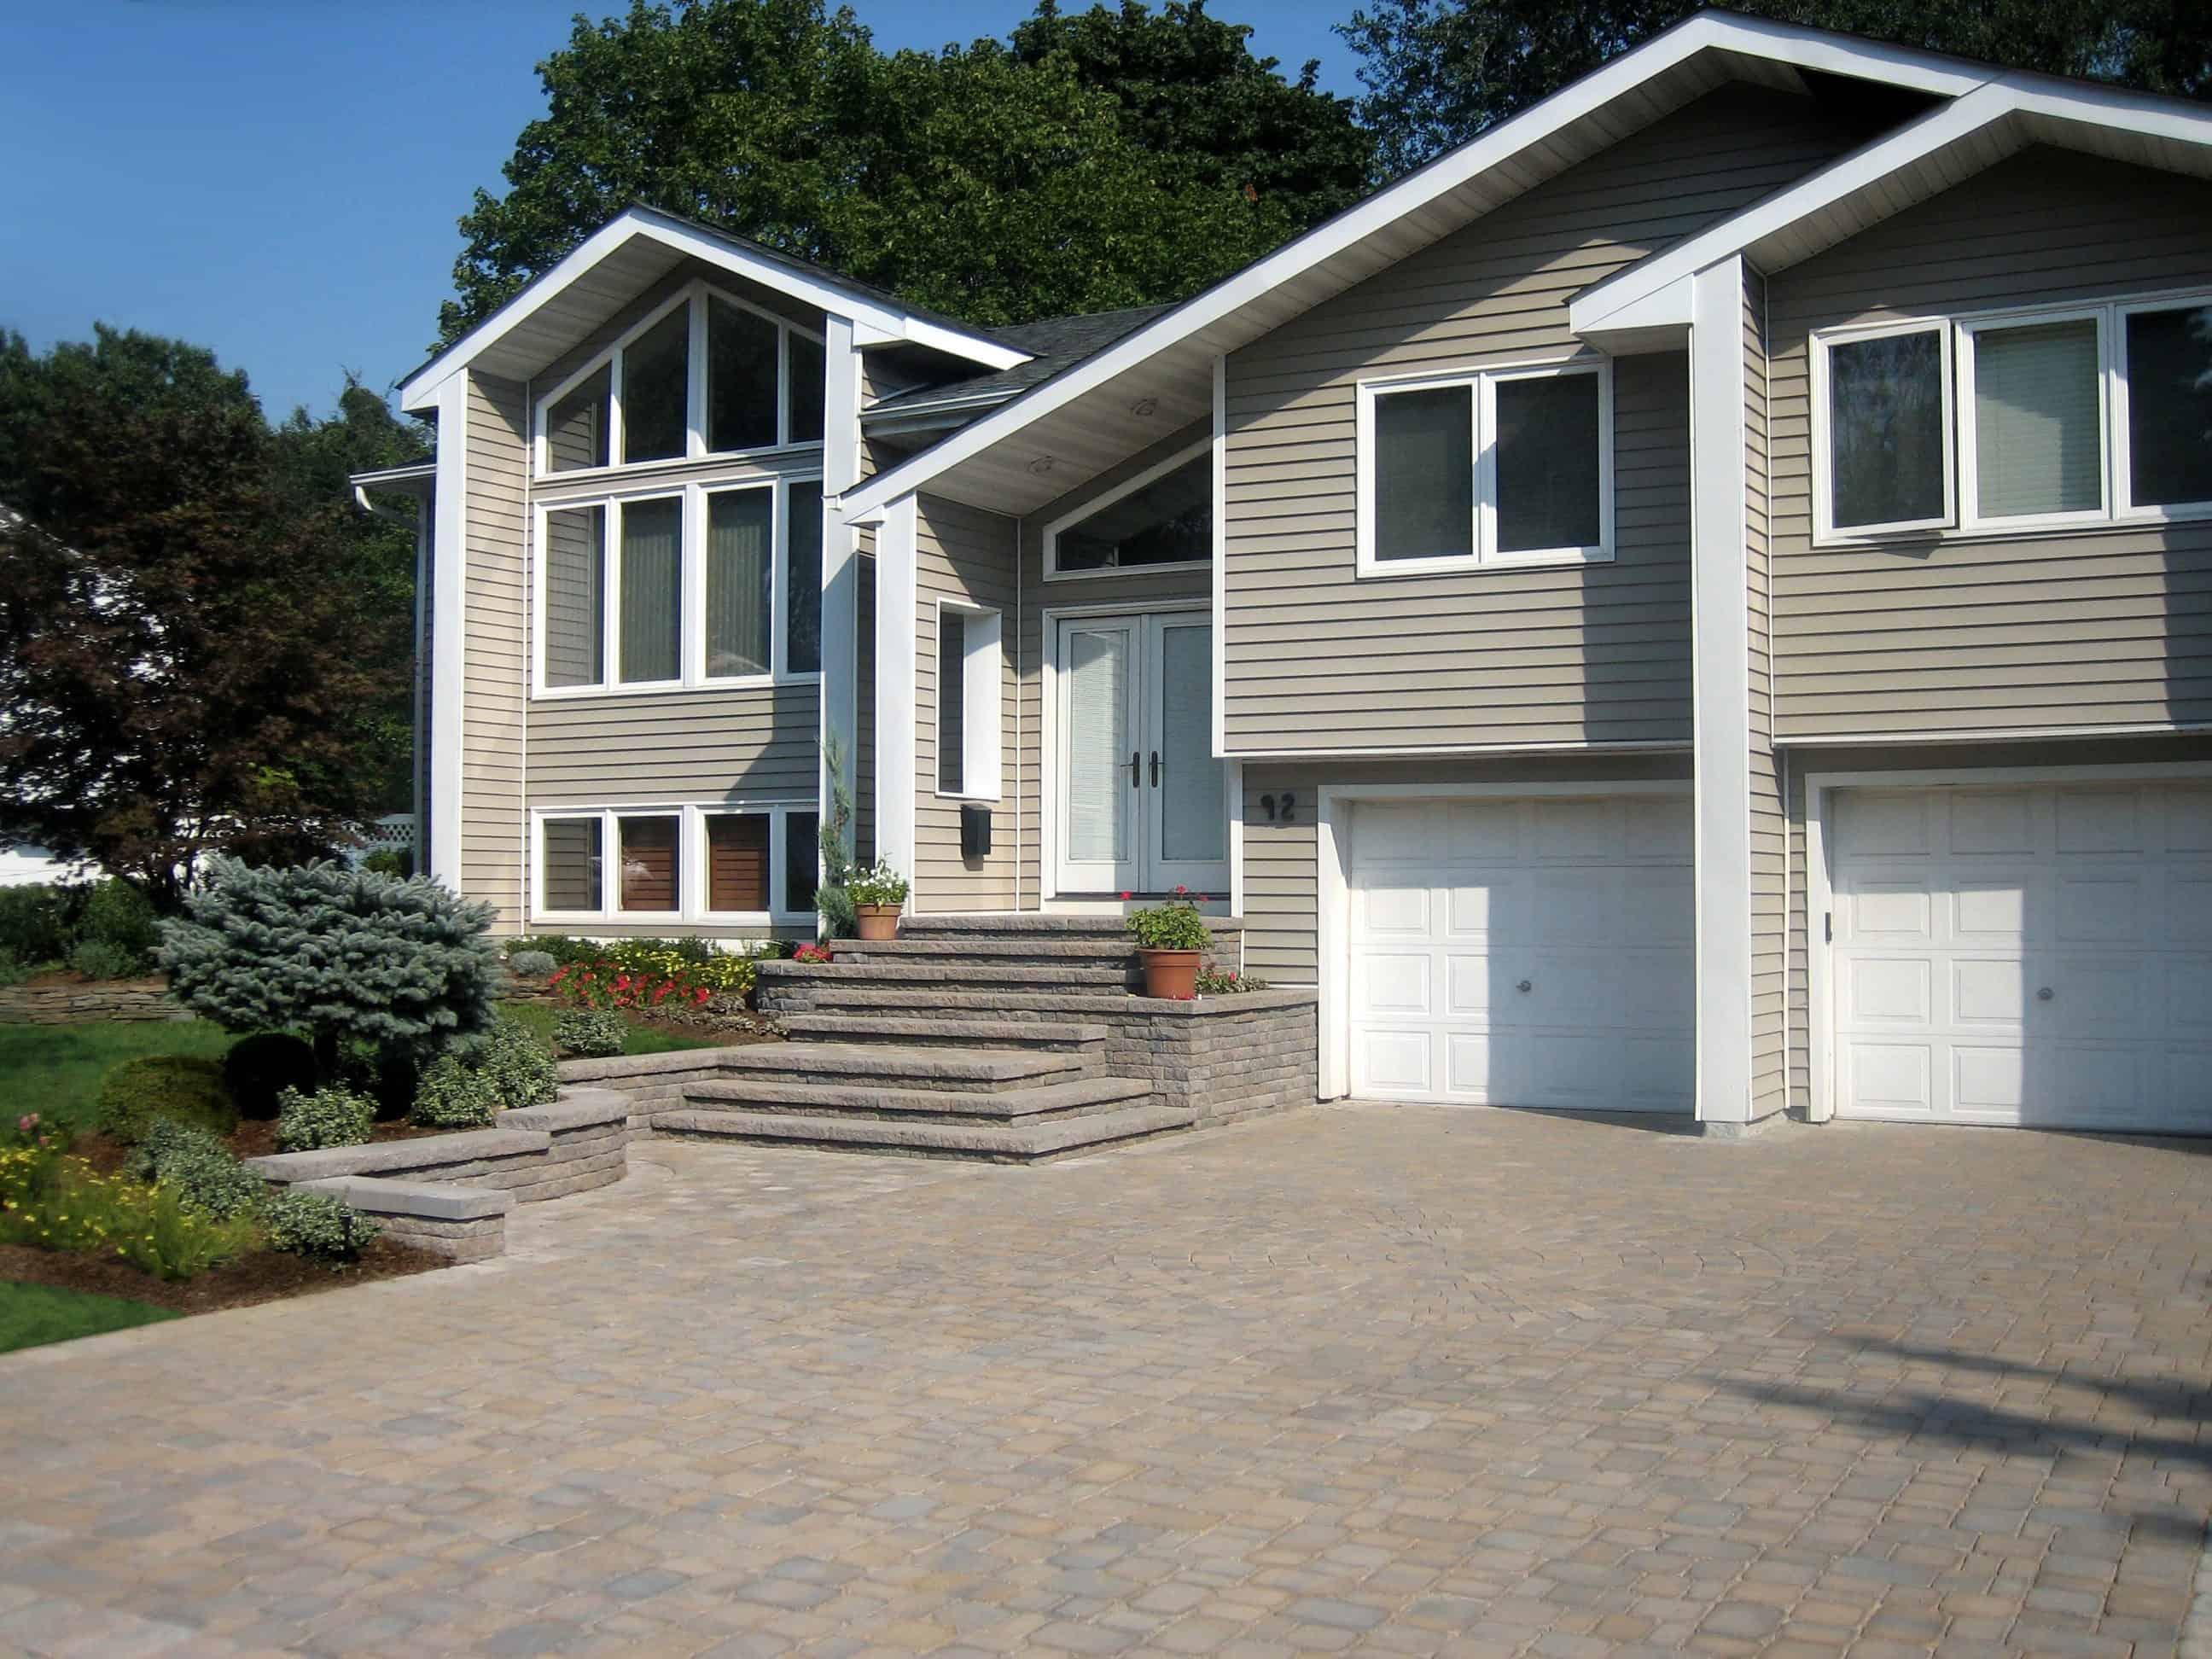 Cambridge Paver Driveway - Ledgestone - Toffee Onyx - Jericho, Long Island NY